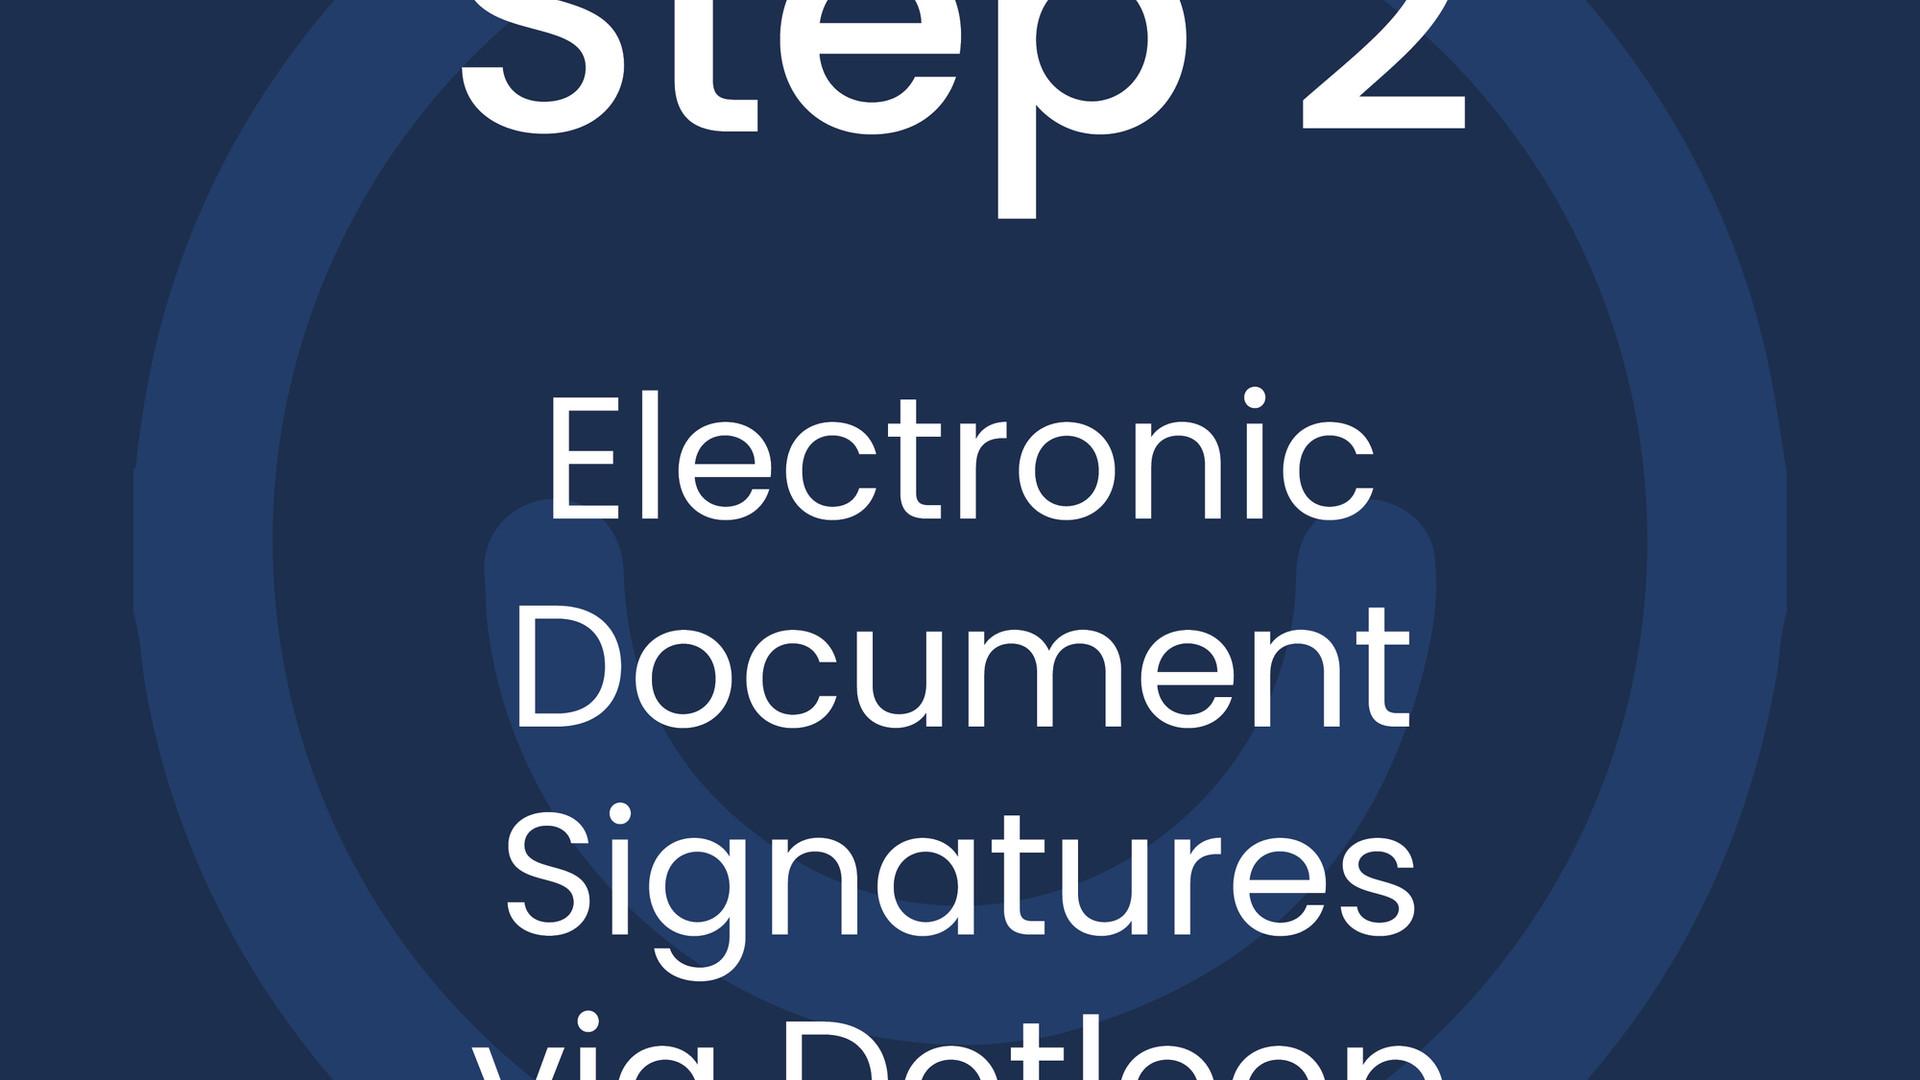 Step 2: Electronic Document Signatures via Dotloop